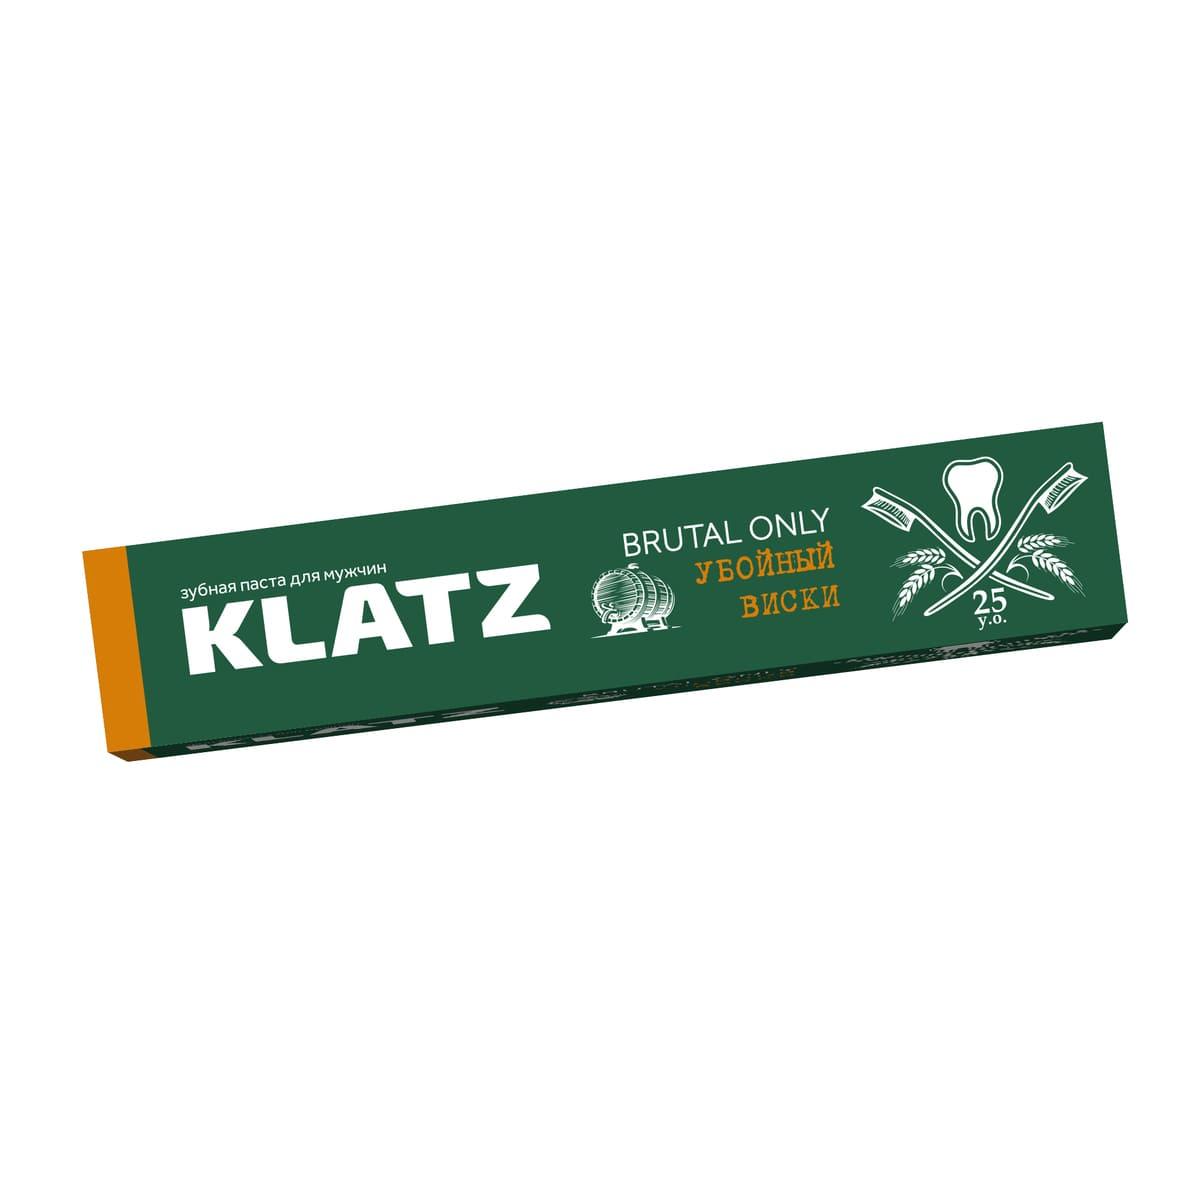 Klatzсо